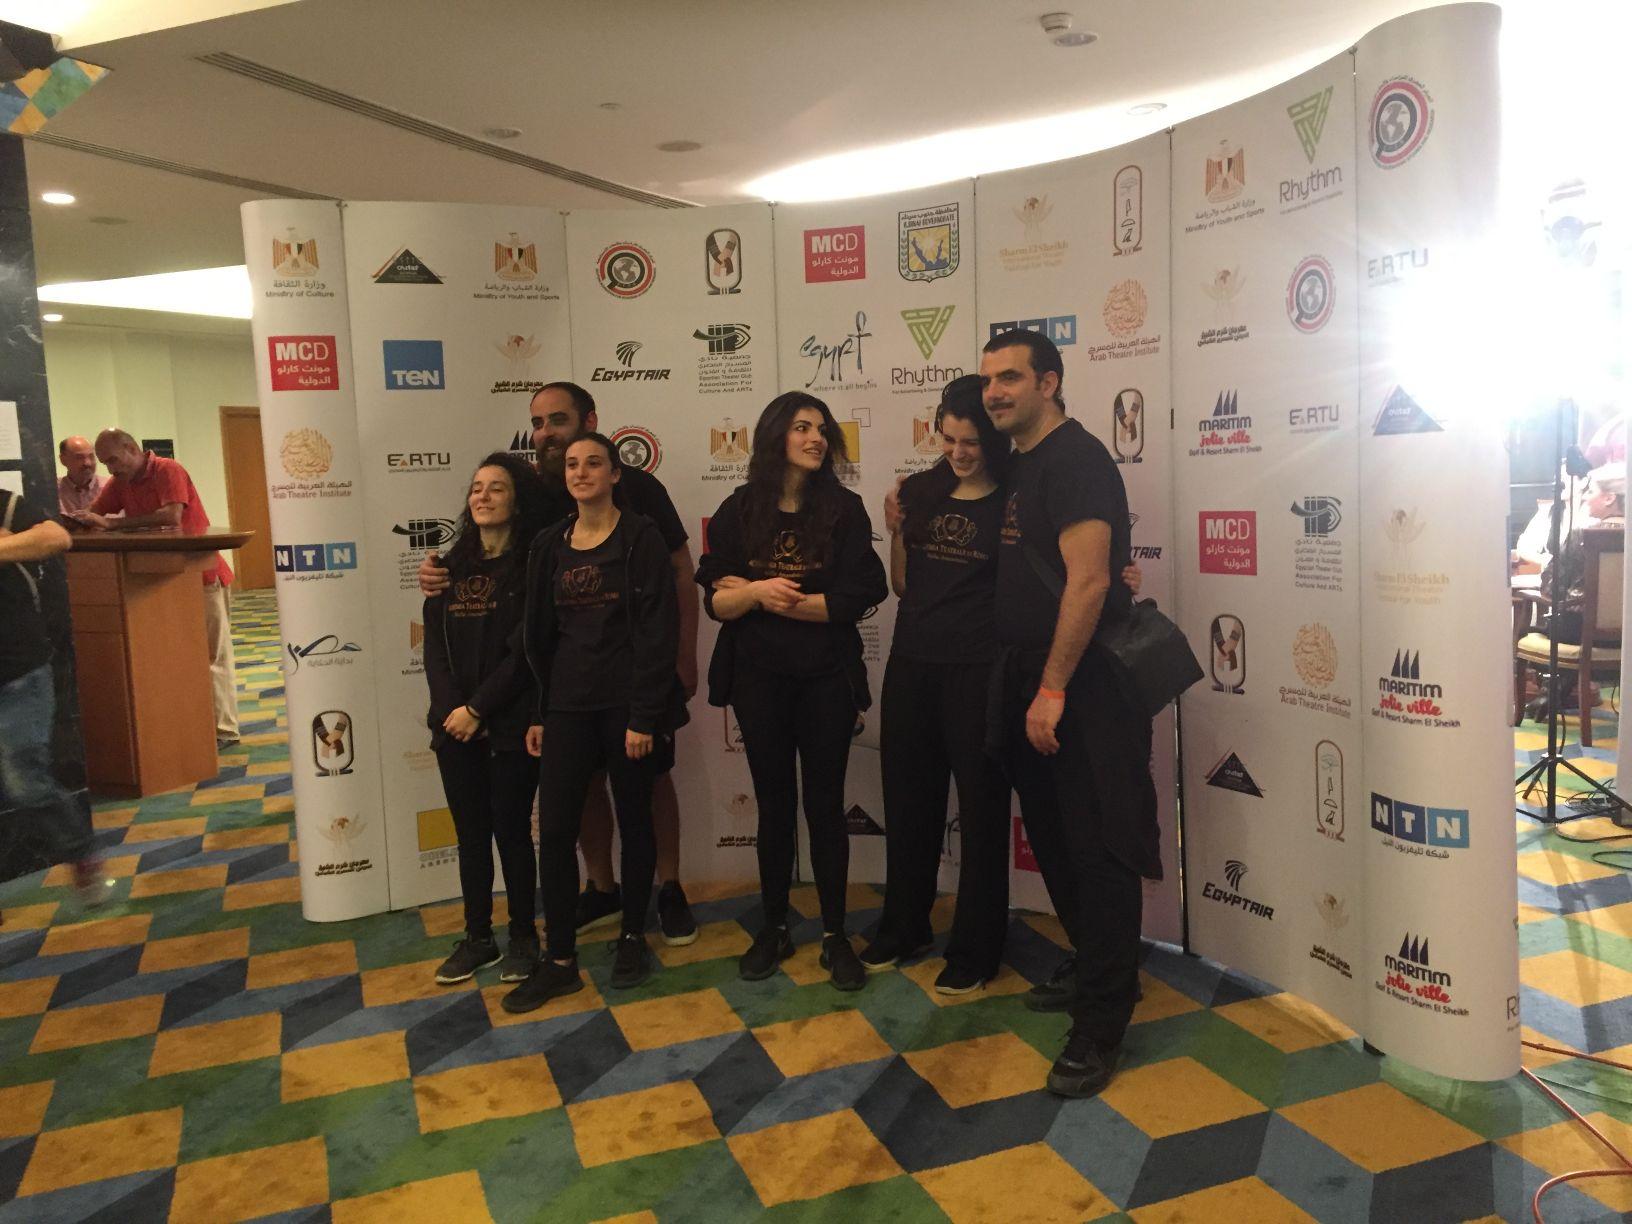 Sharm El Sheikh International Theater Festival For Youth 5